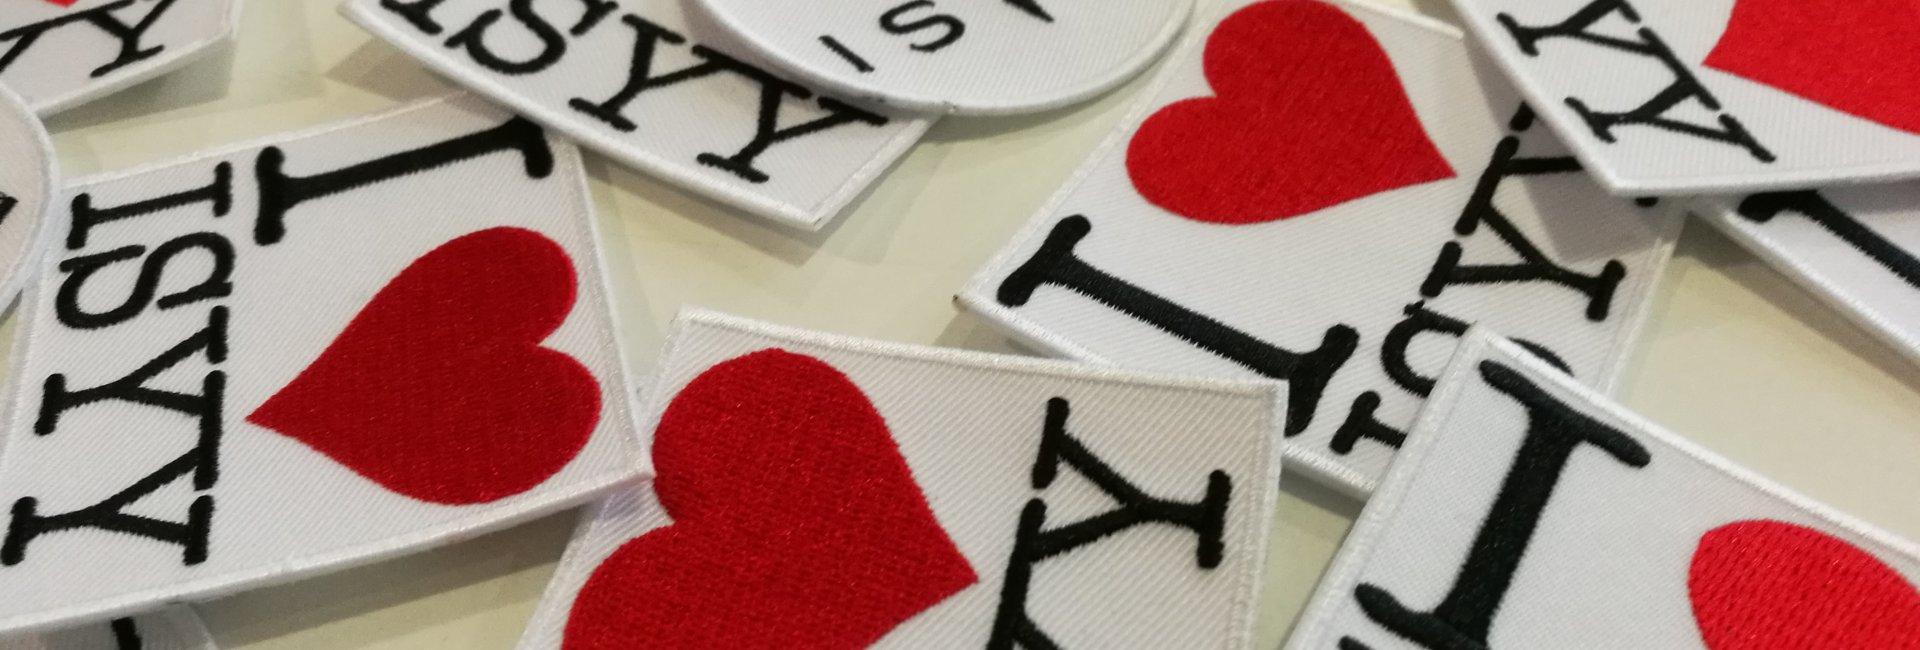 Sokea dating budjetti